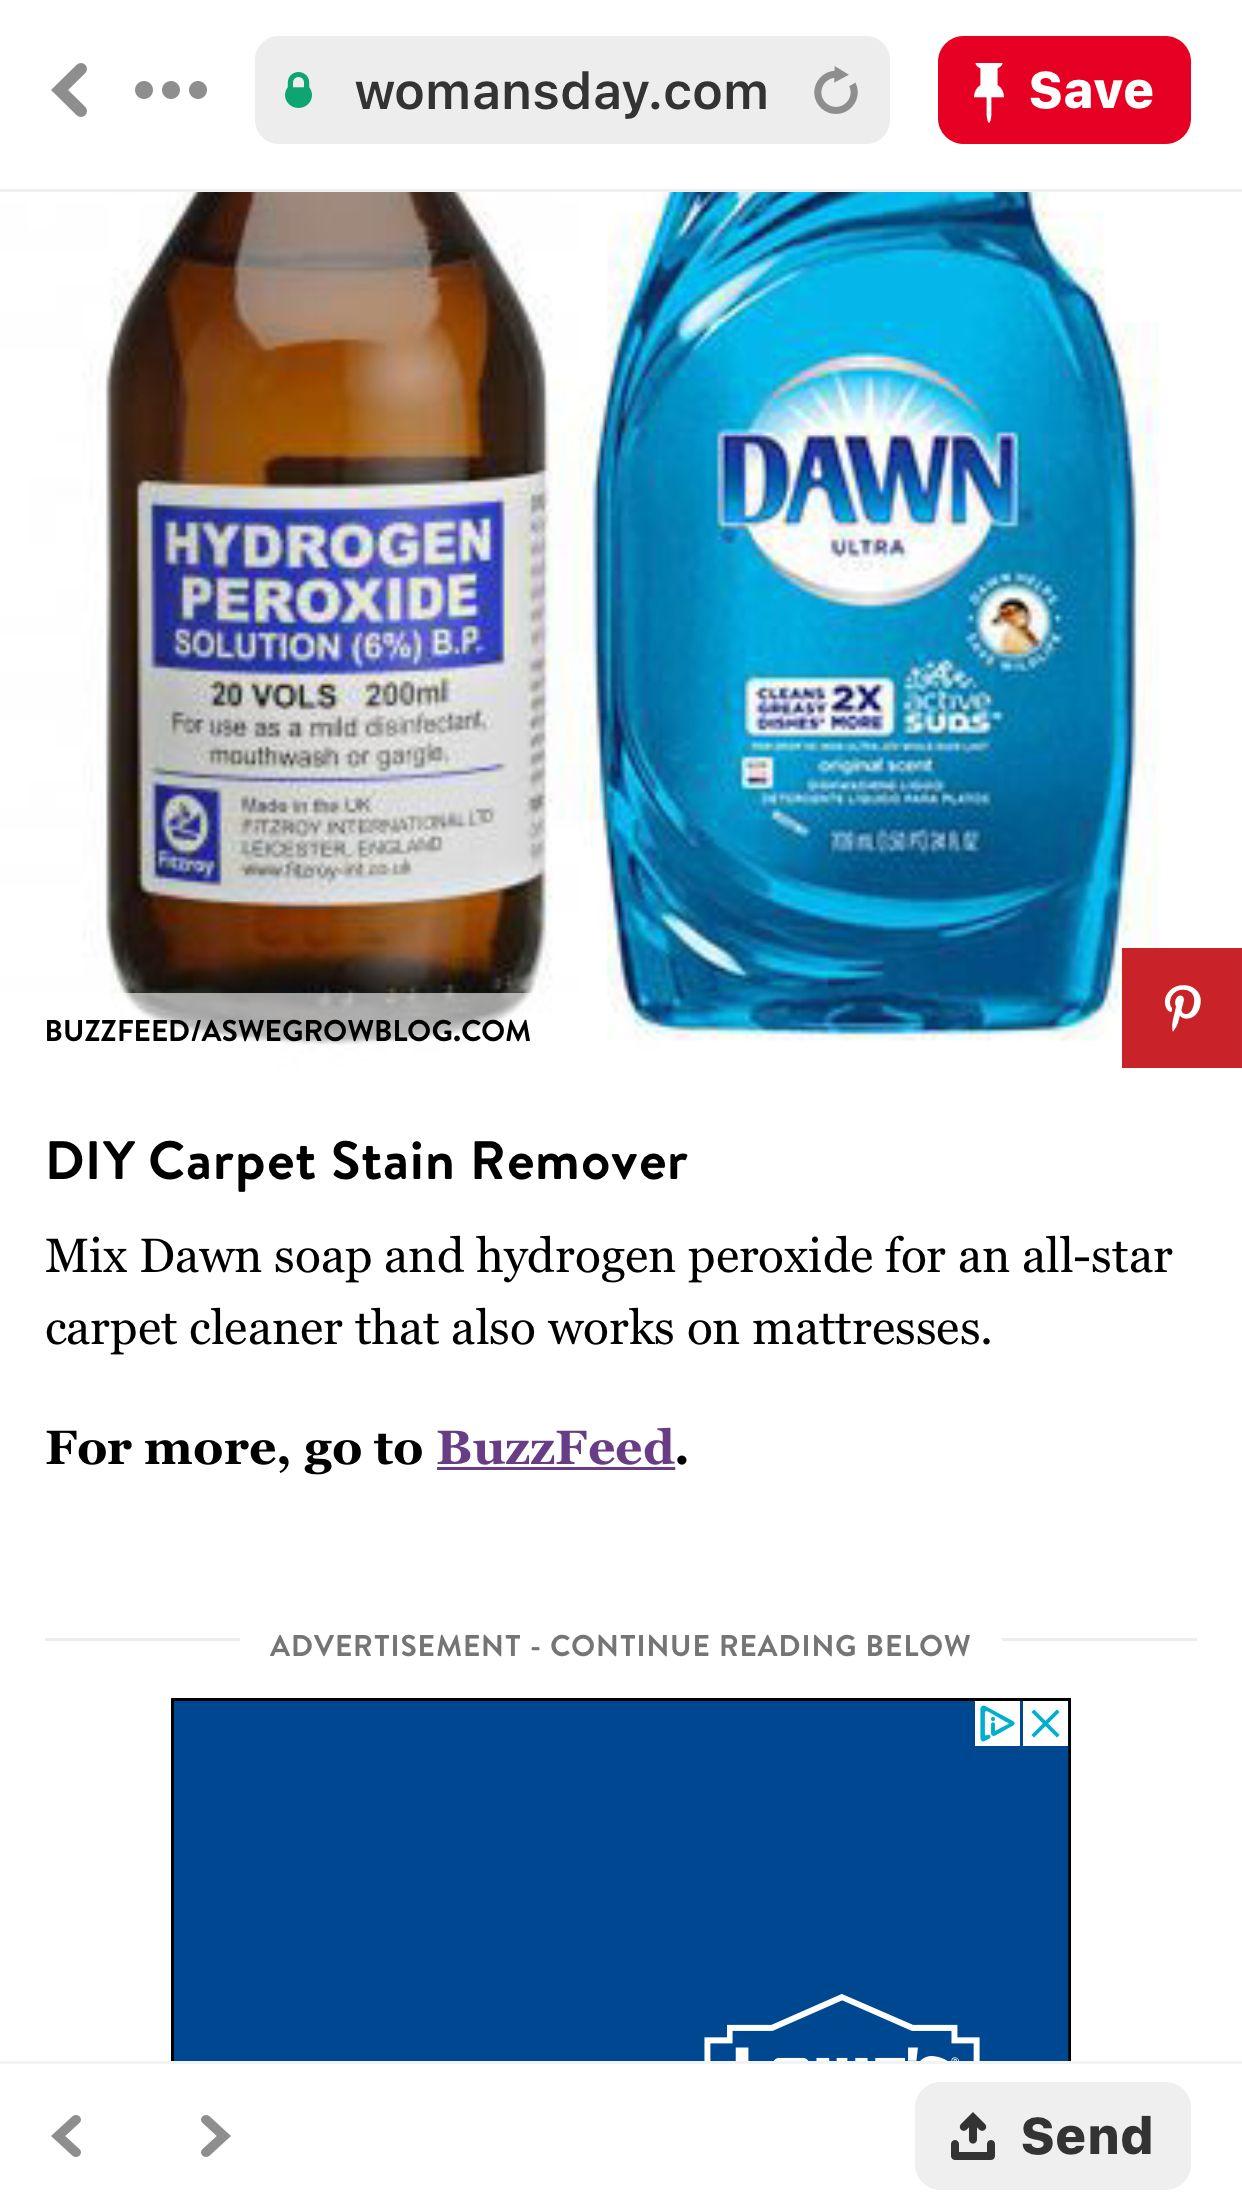 Pin By Amy Chouinard On House Sale Diy Carpet Stain Remover Stain Remover Carpet Diy Carpet